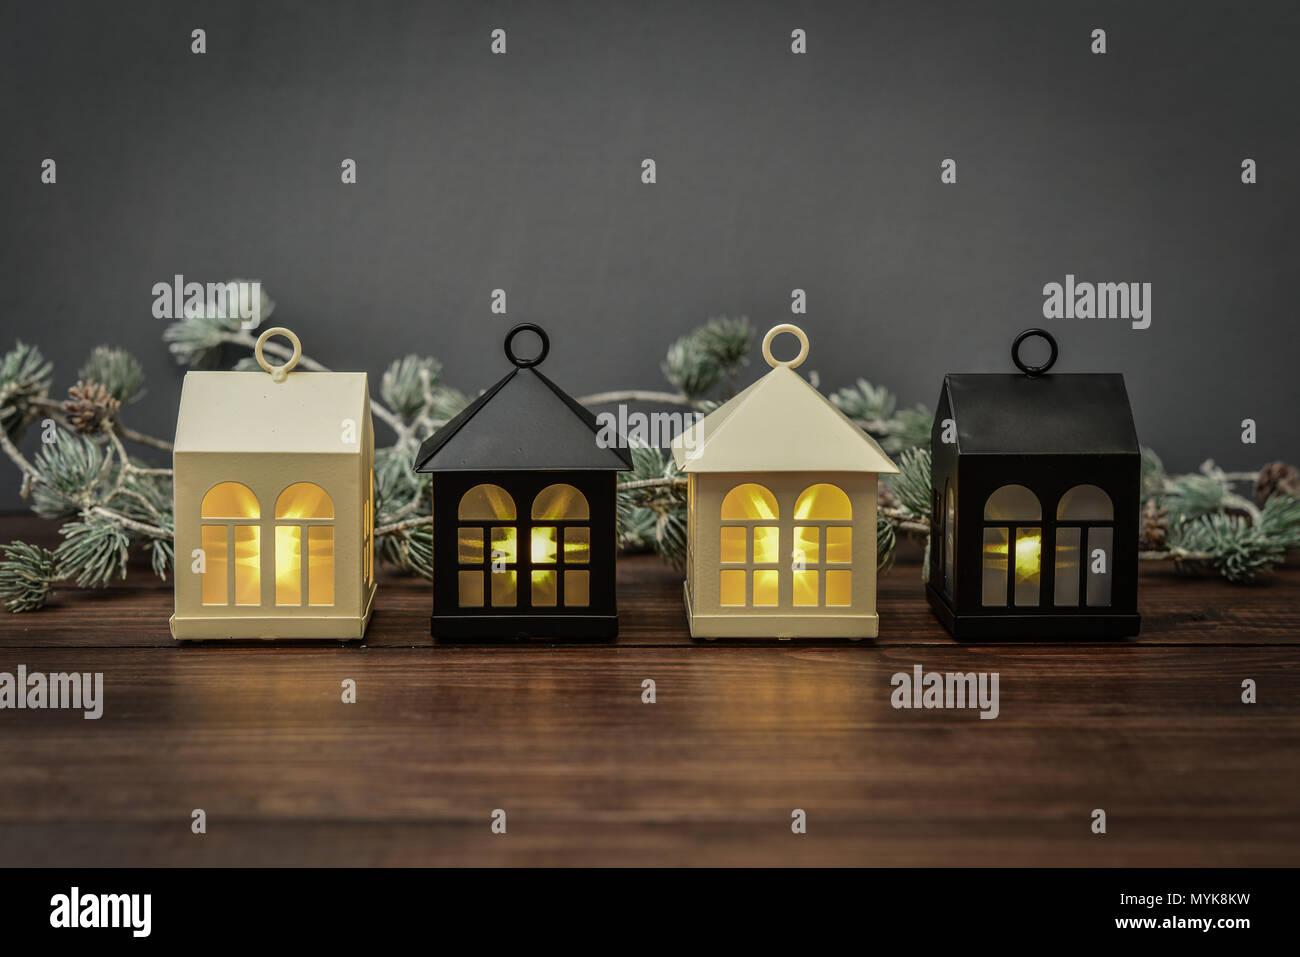 8d273fd6a0e Fila de lámparas decorativas en forma de pequeñas casas - Decoración de Navidad  sobre fondo de madera closeup